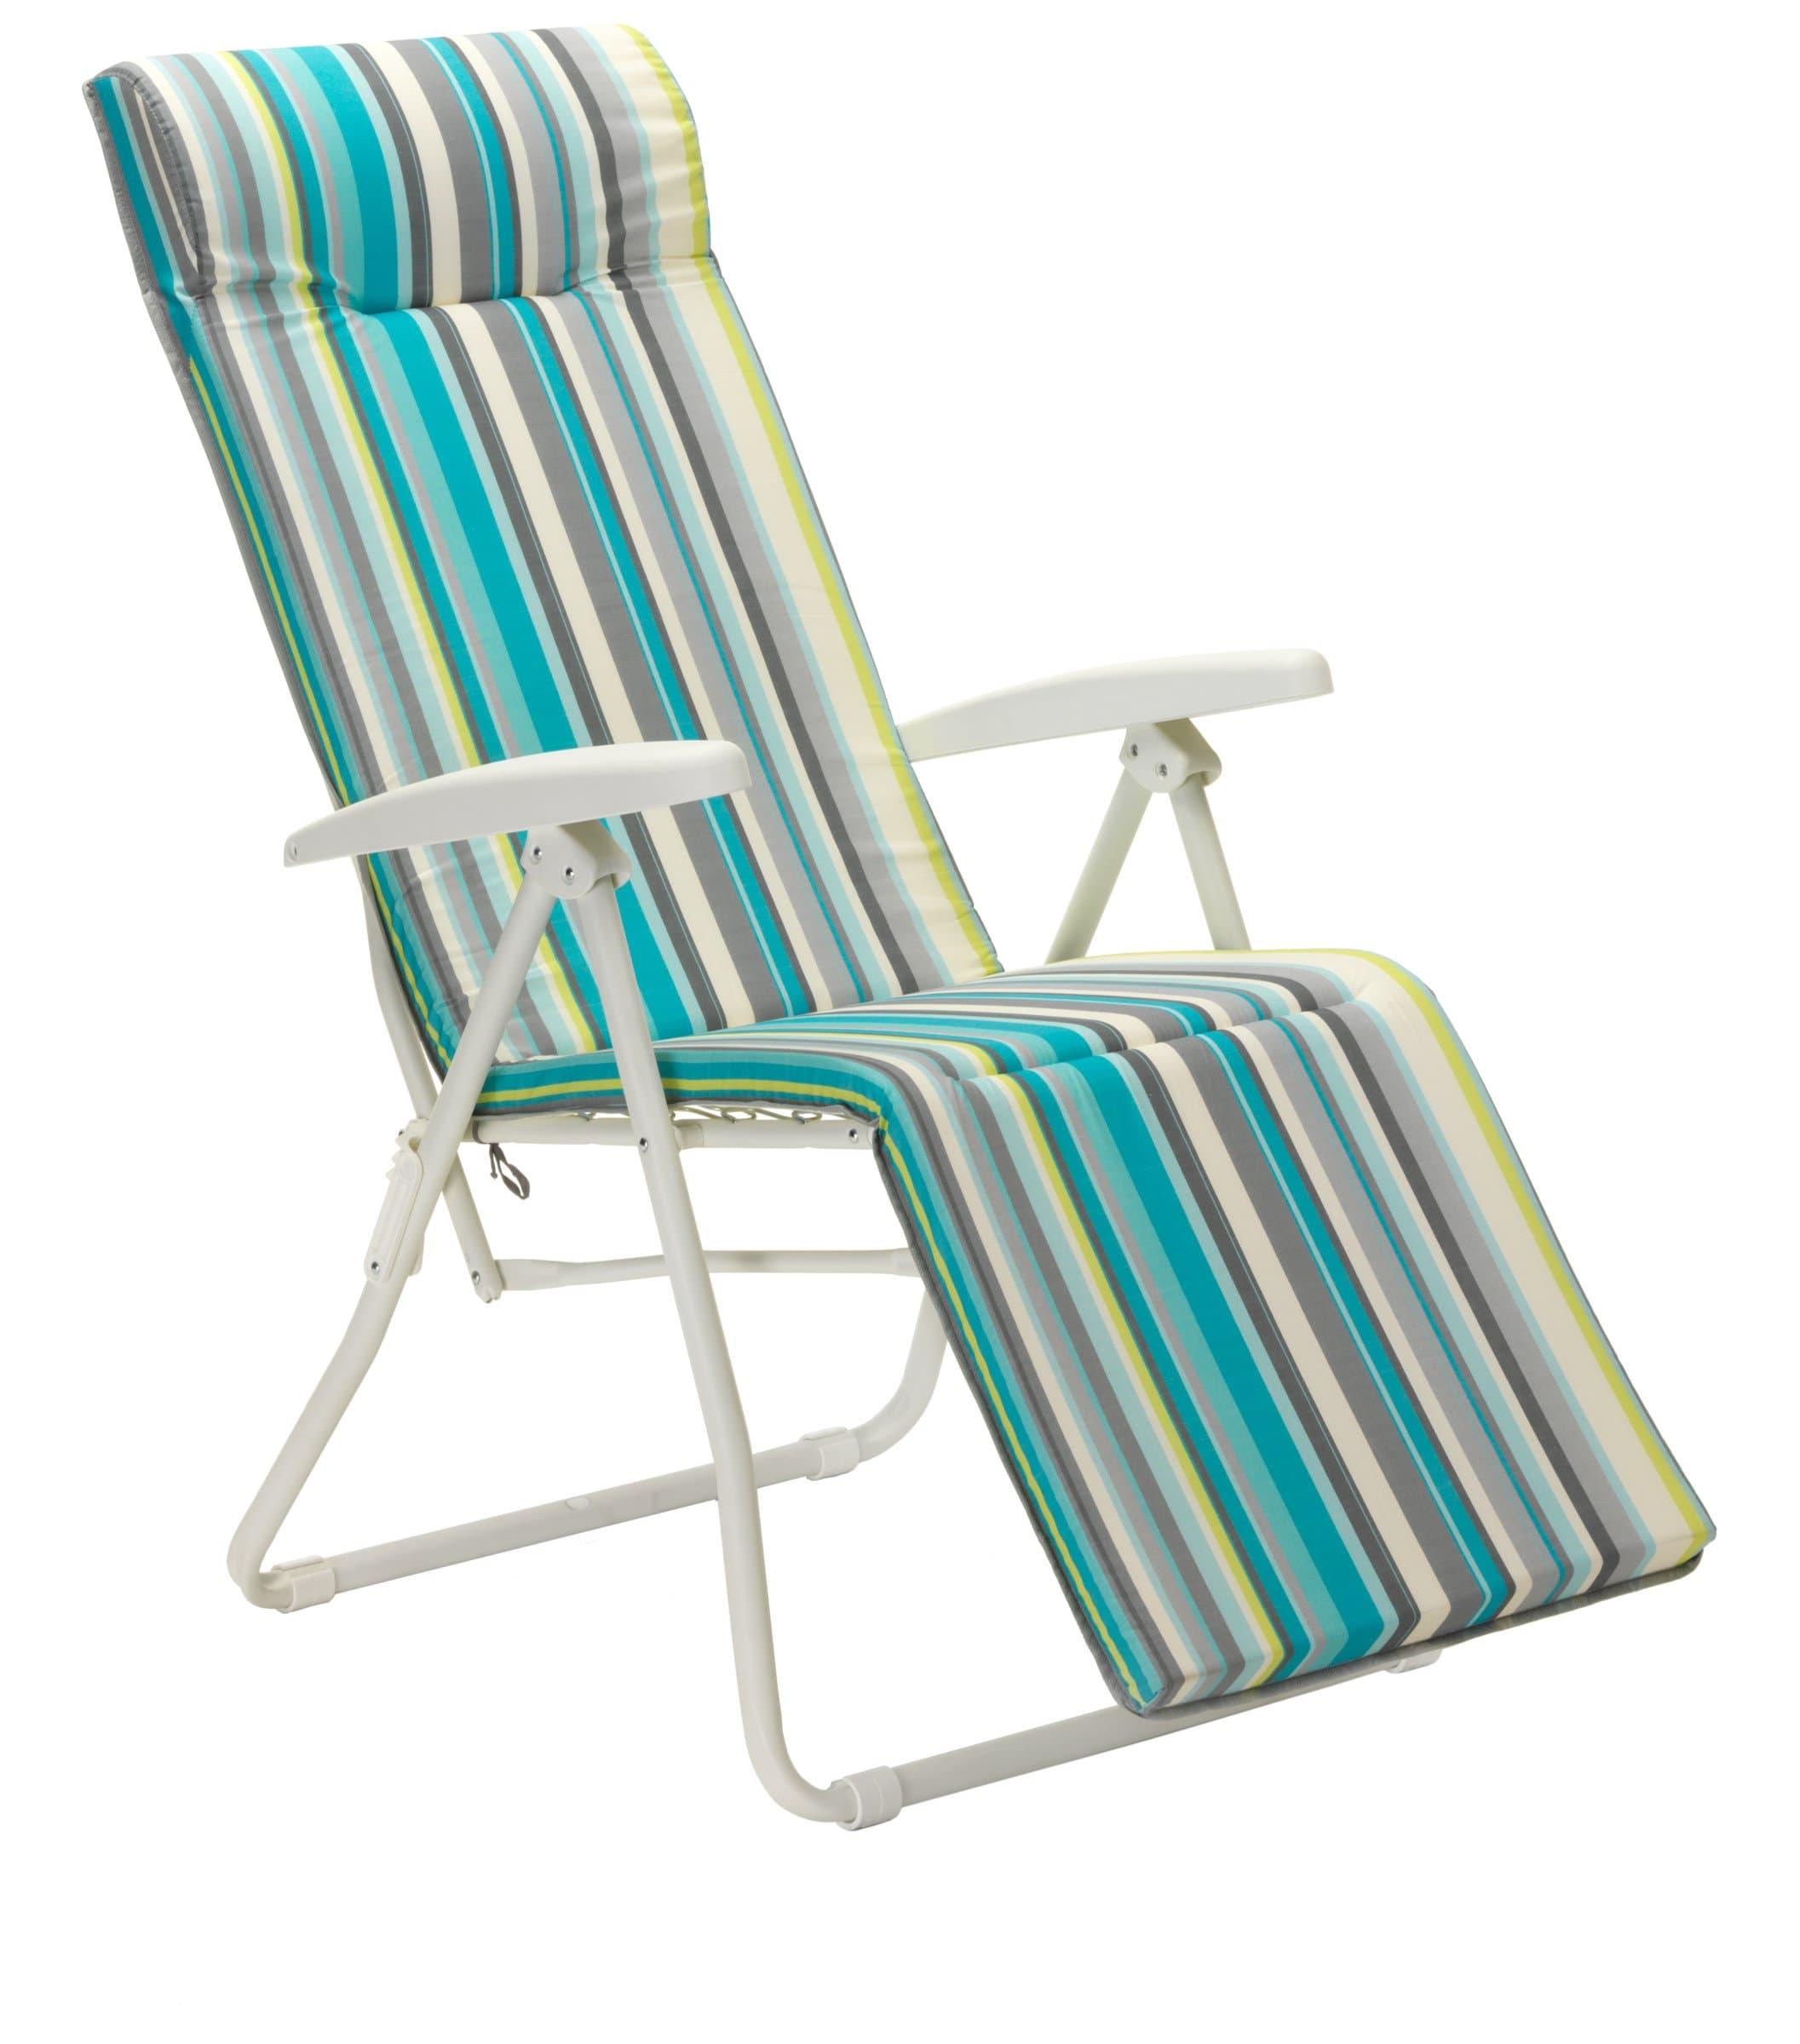 chaise longue relax avec coussin migros. Black Bedroom Furniture Sets. Home Design Ideas